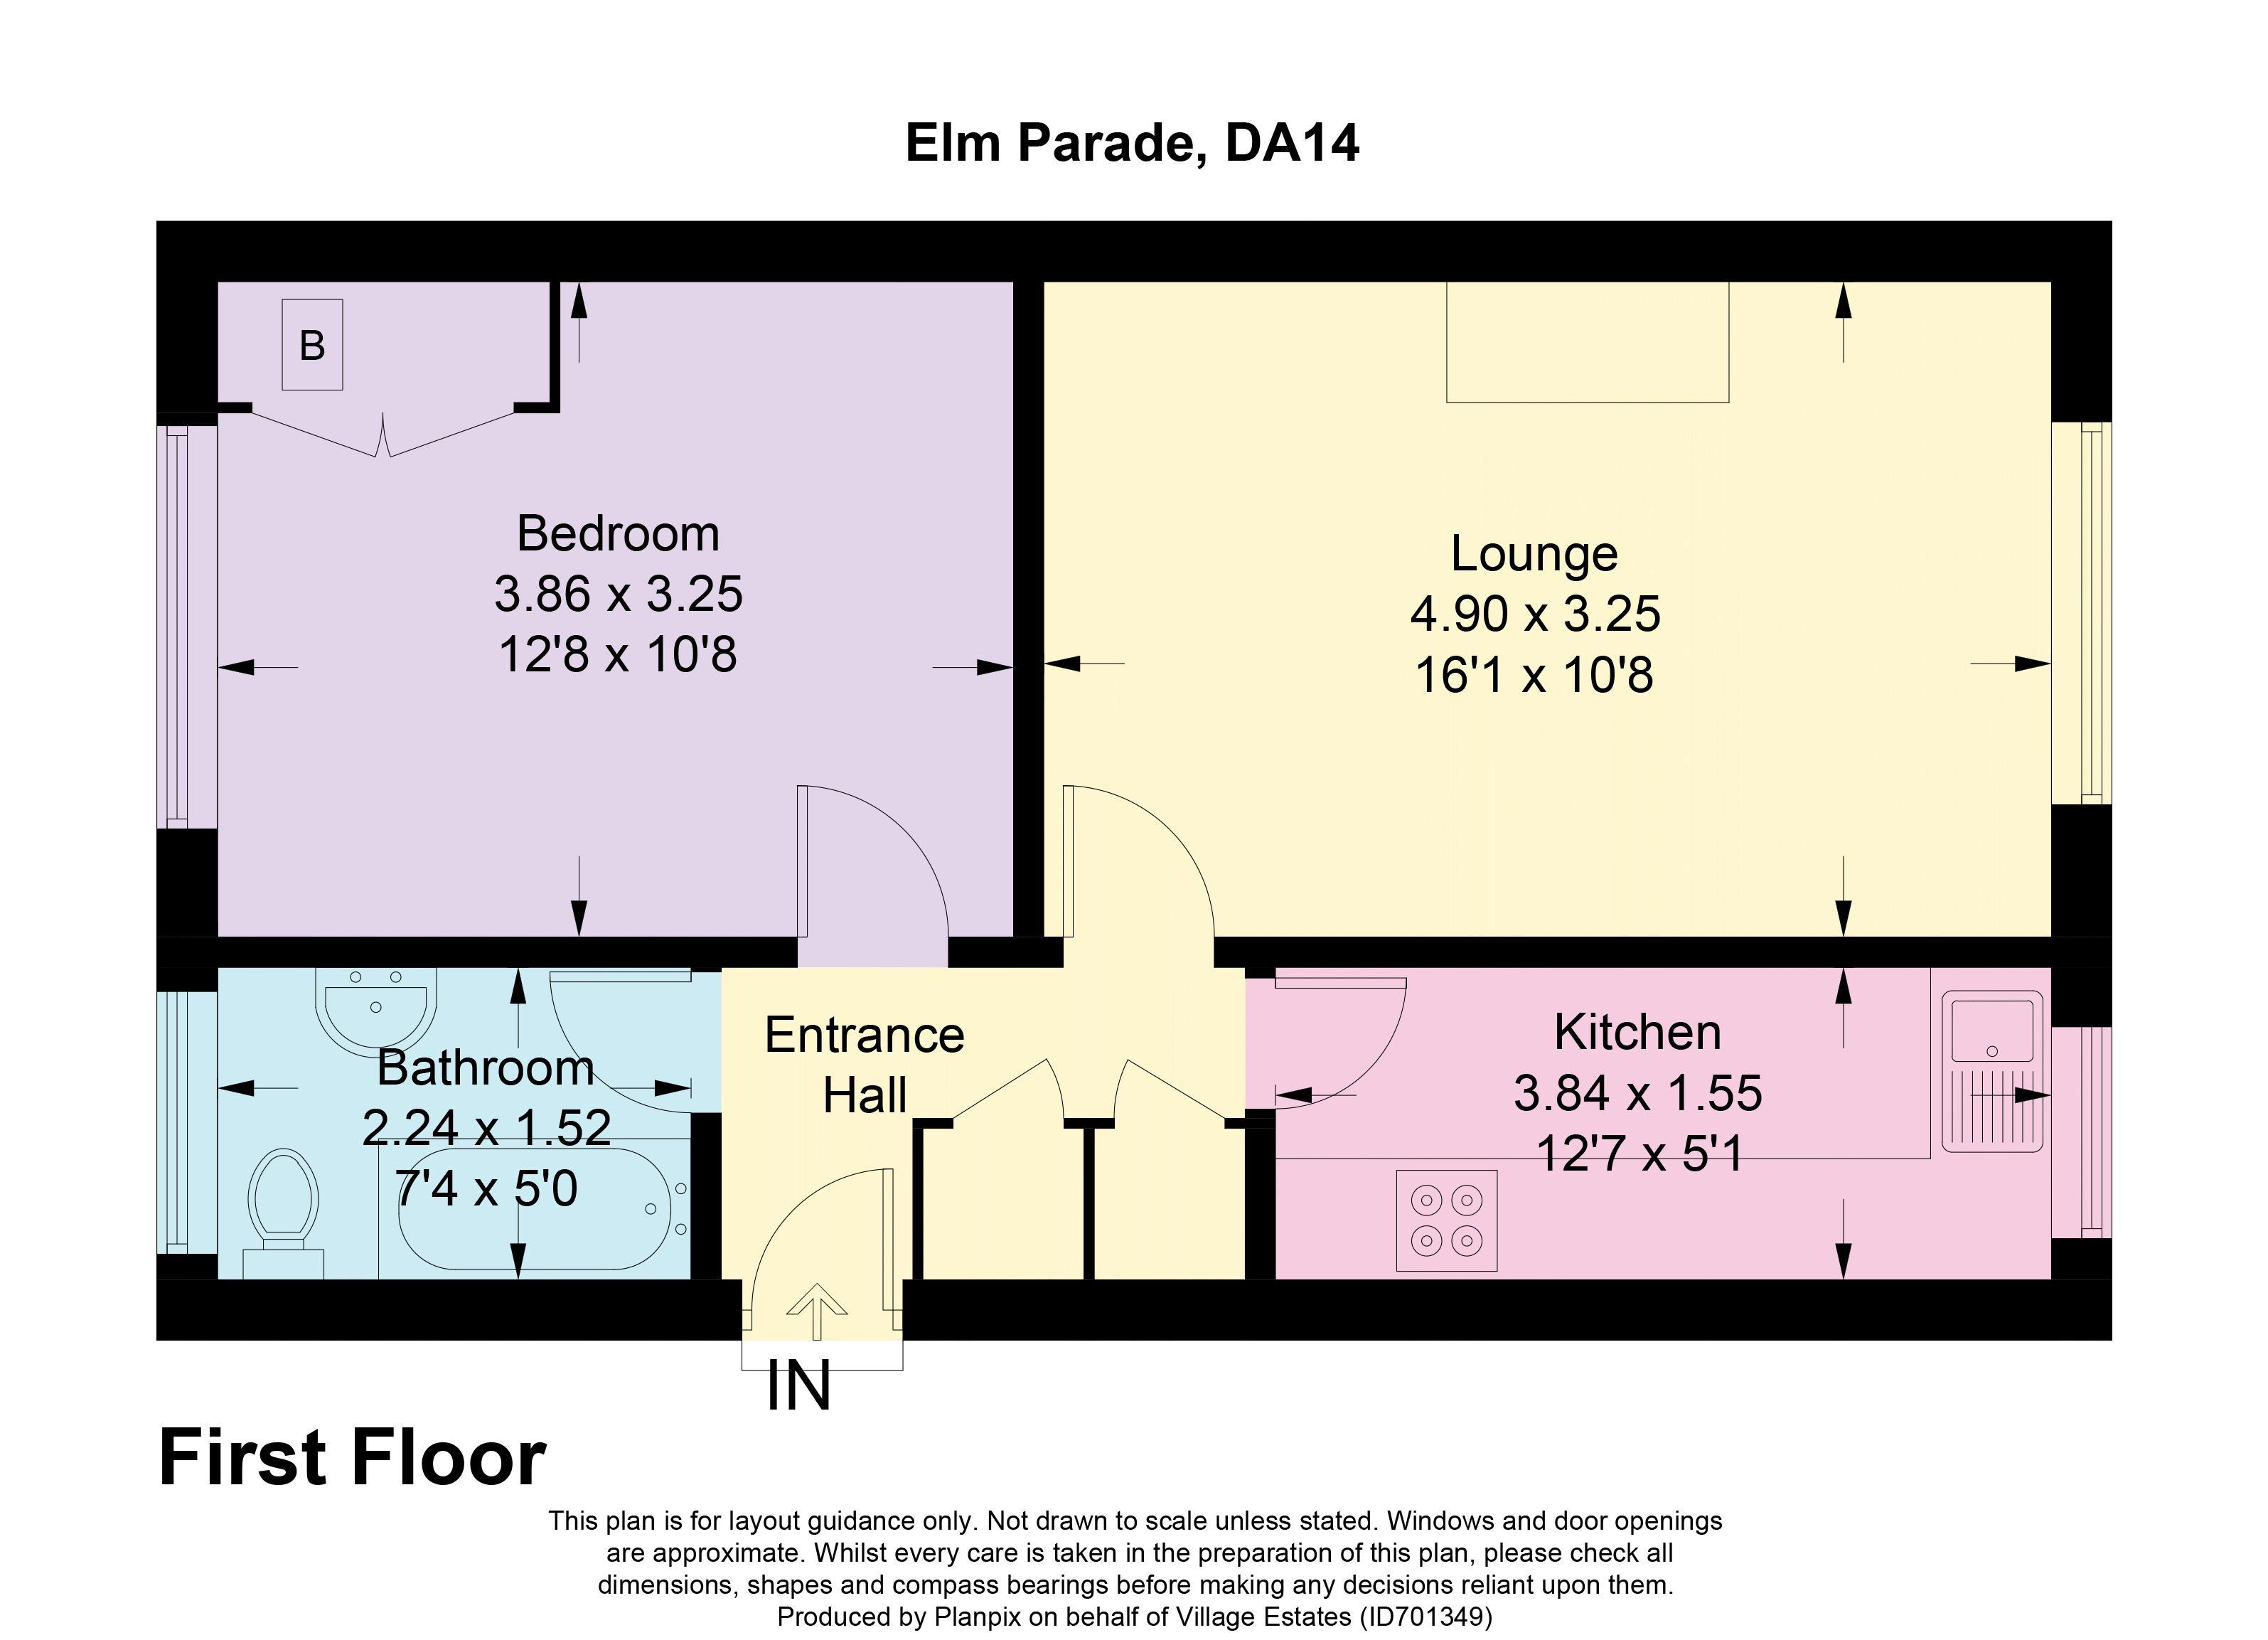 Elm Parade Floorplan